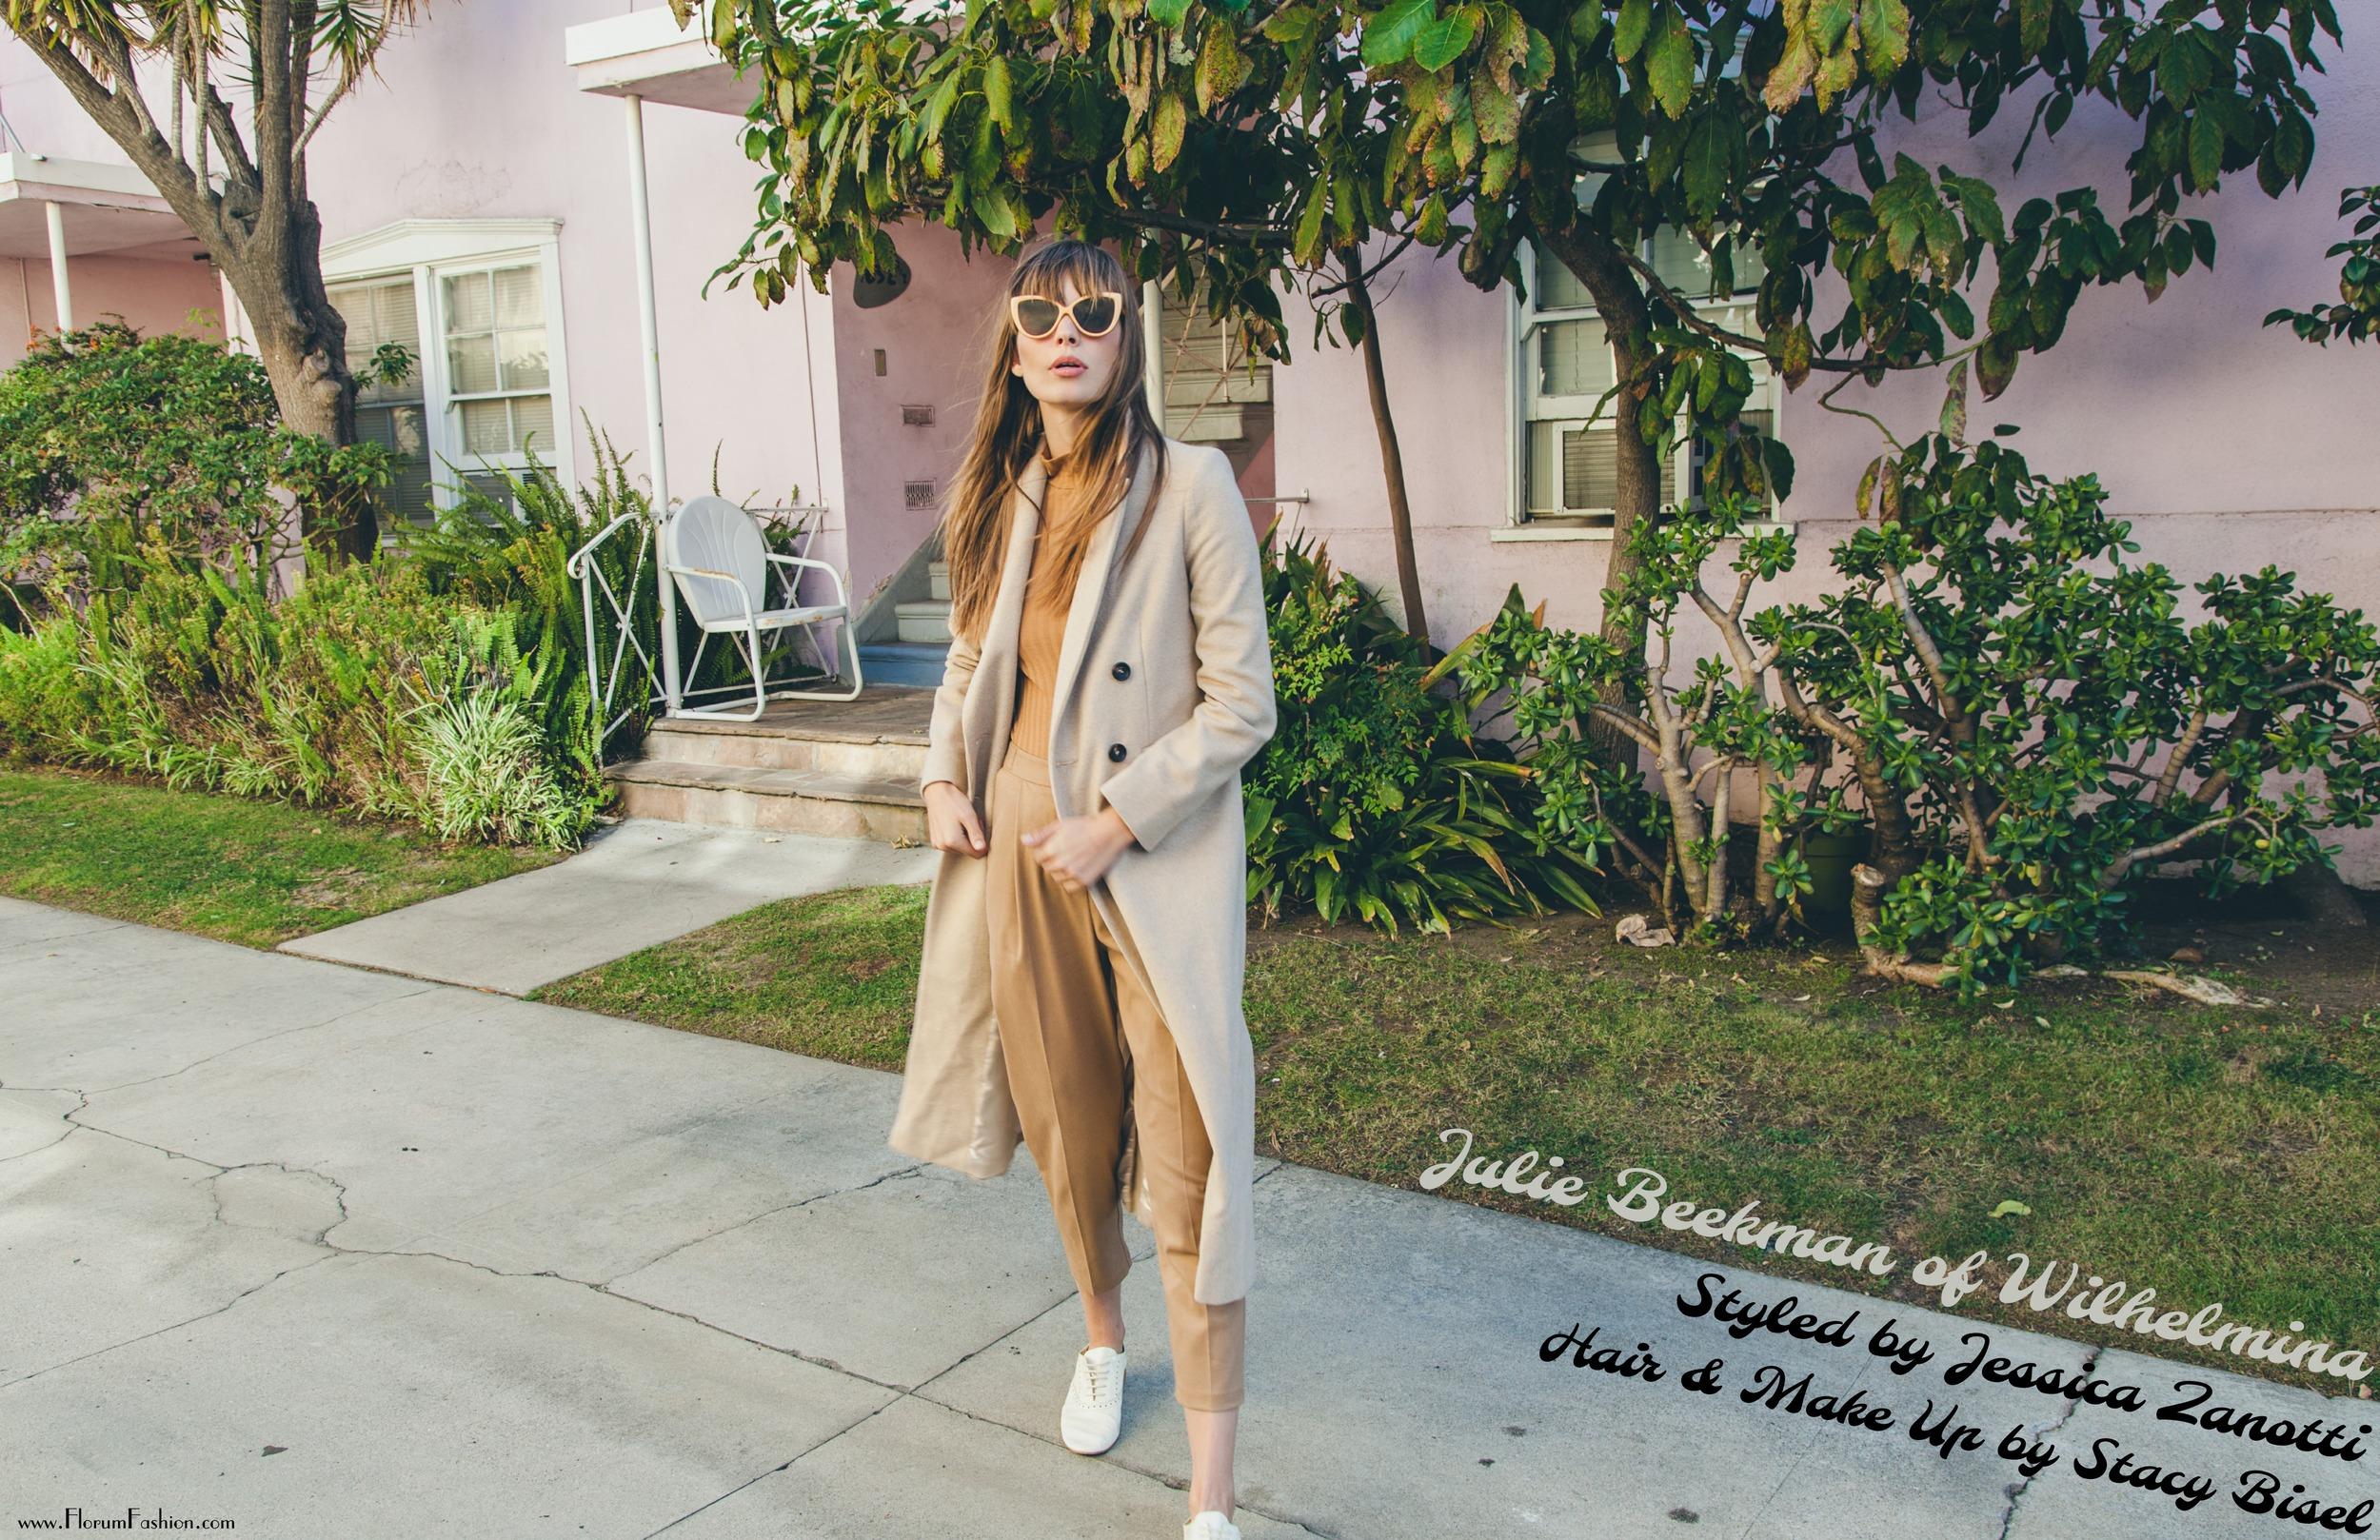 Une Jolie Femme by Liza Boone for Florum Fashion Magazine